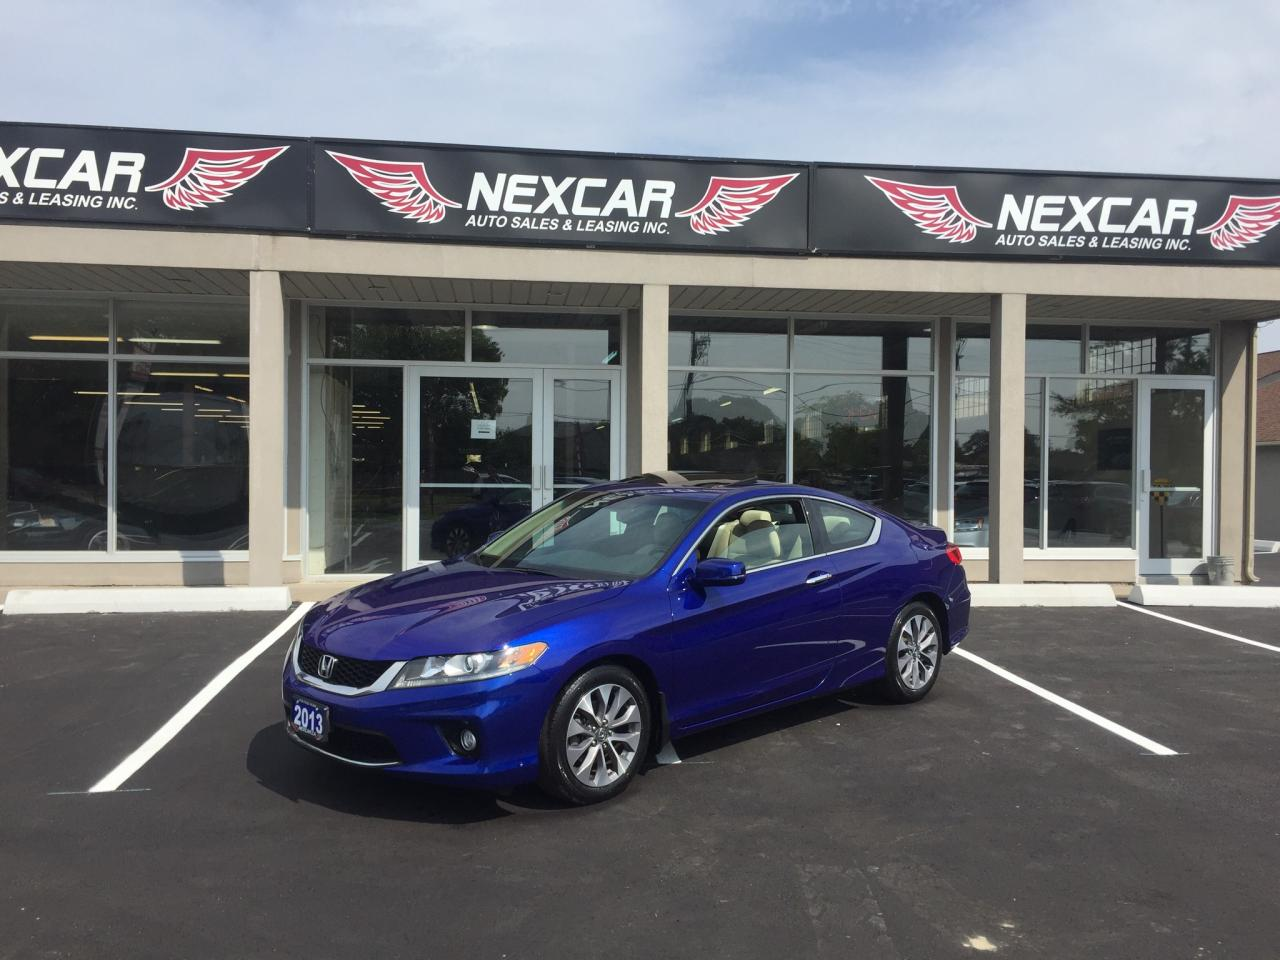 Photo of Blue 2013 Honda Accord